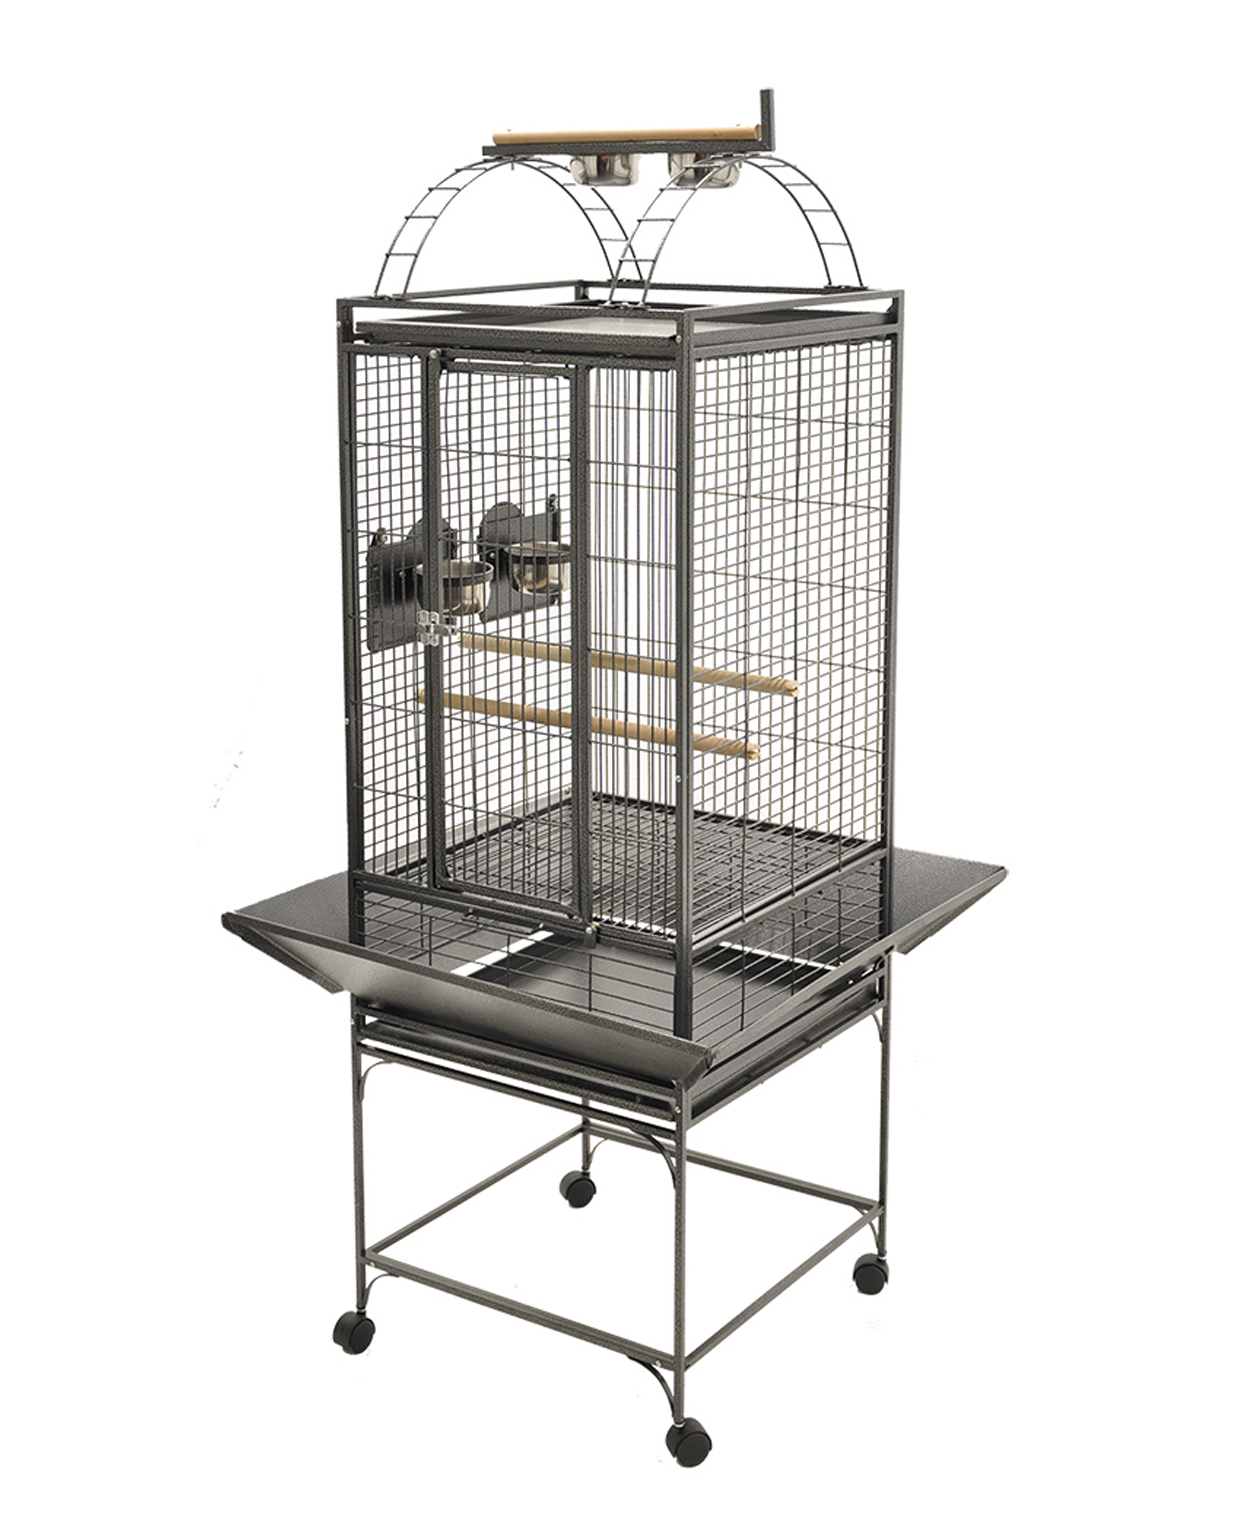 Cage pour Perroquet Evita 1 Gris Martelé de Vadigran